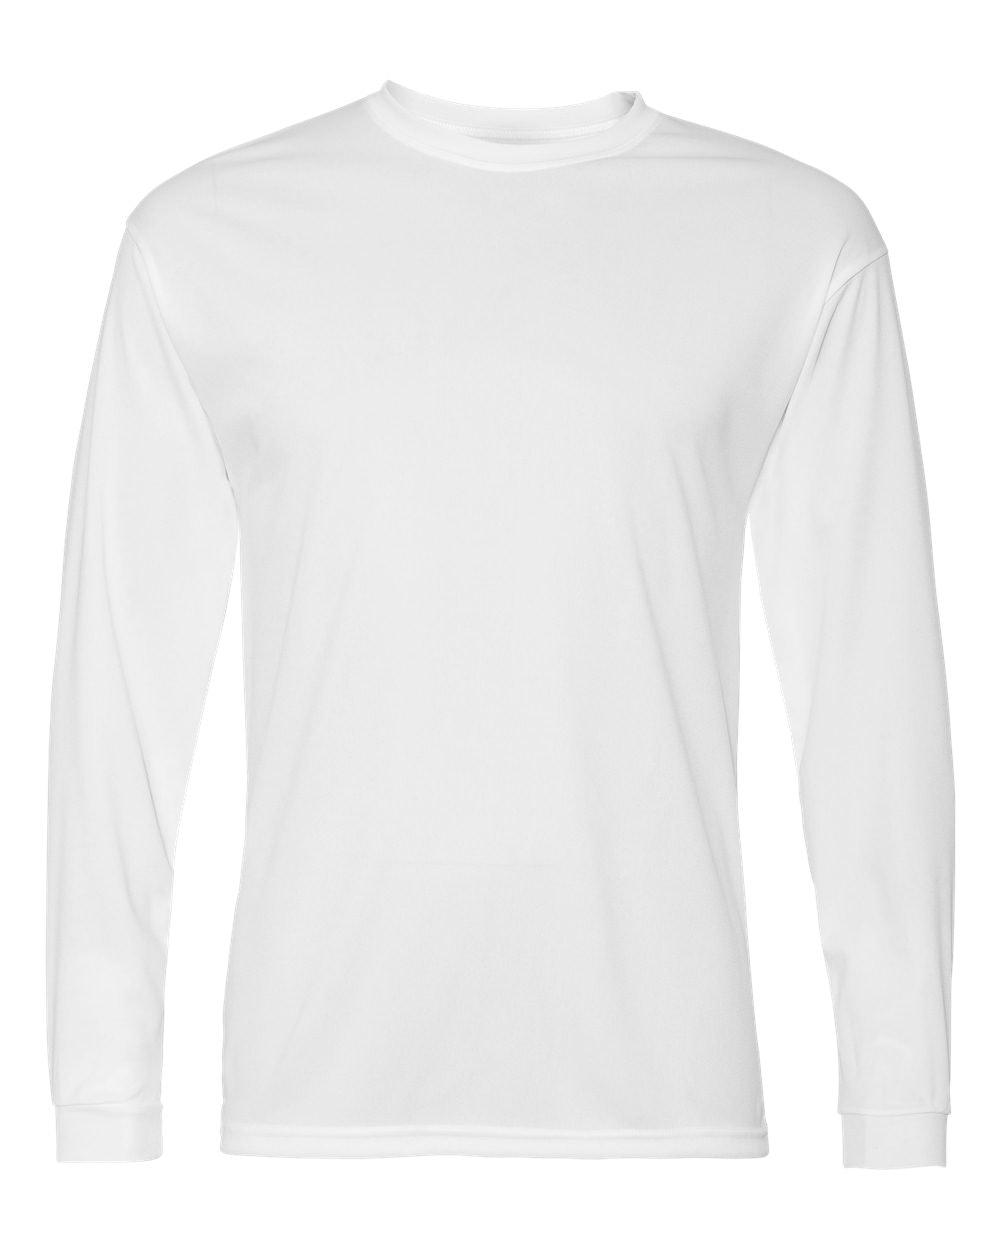 C2 Sport 5104 White